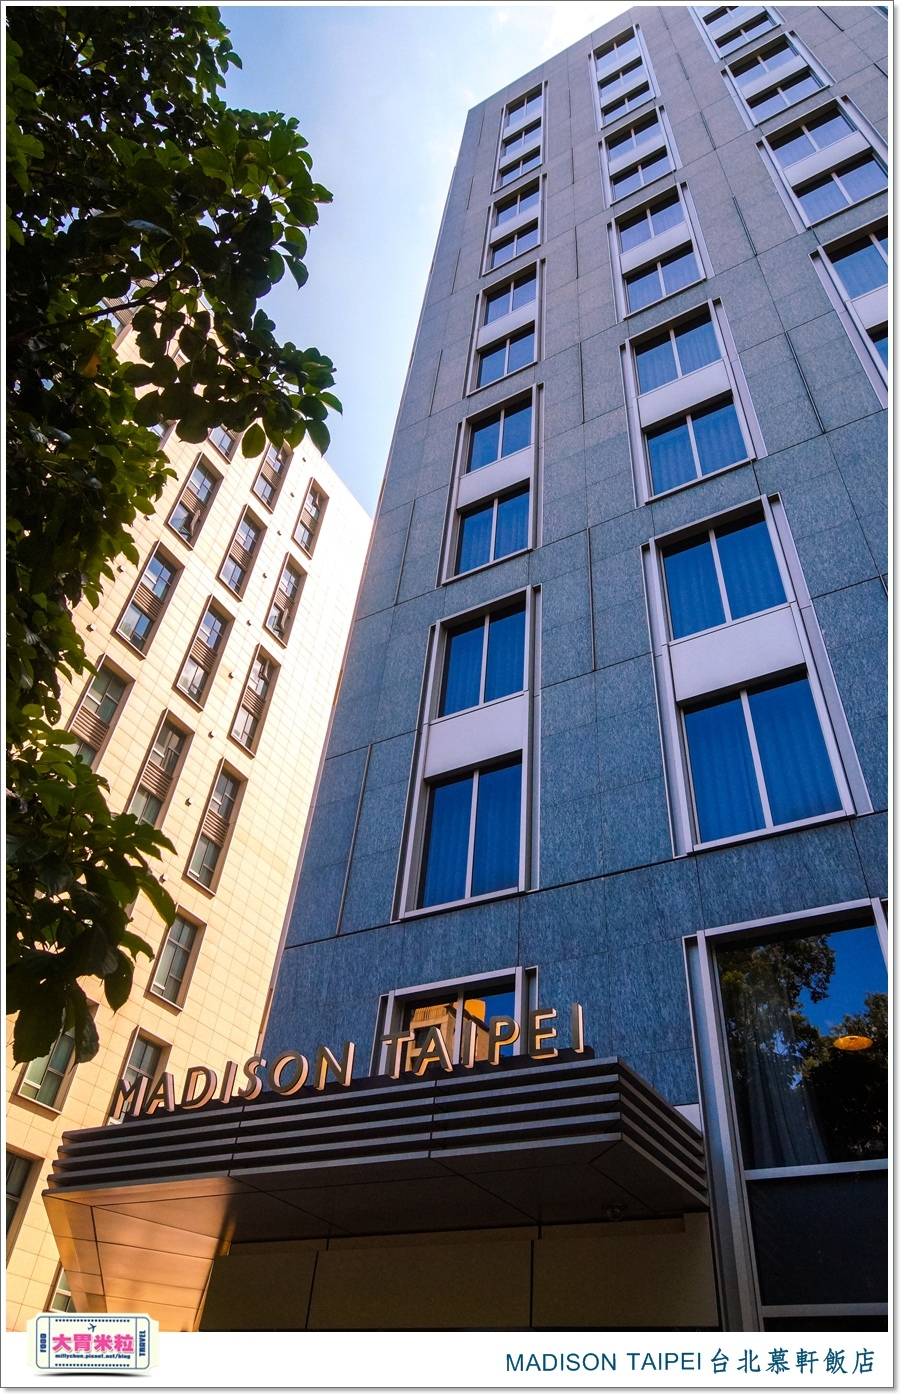 MADISON TAIPEI台北慕軒飯店@大胃米粒0116.jpg